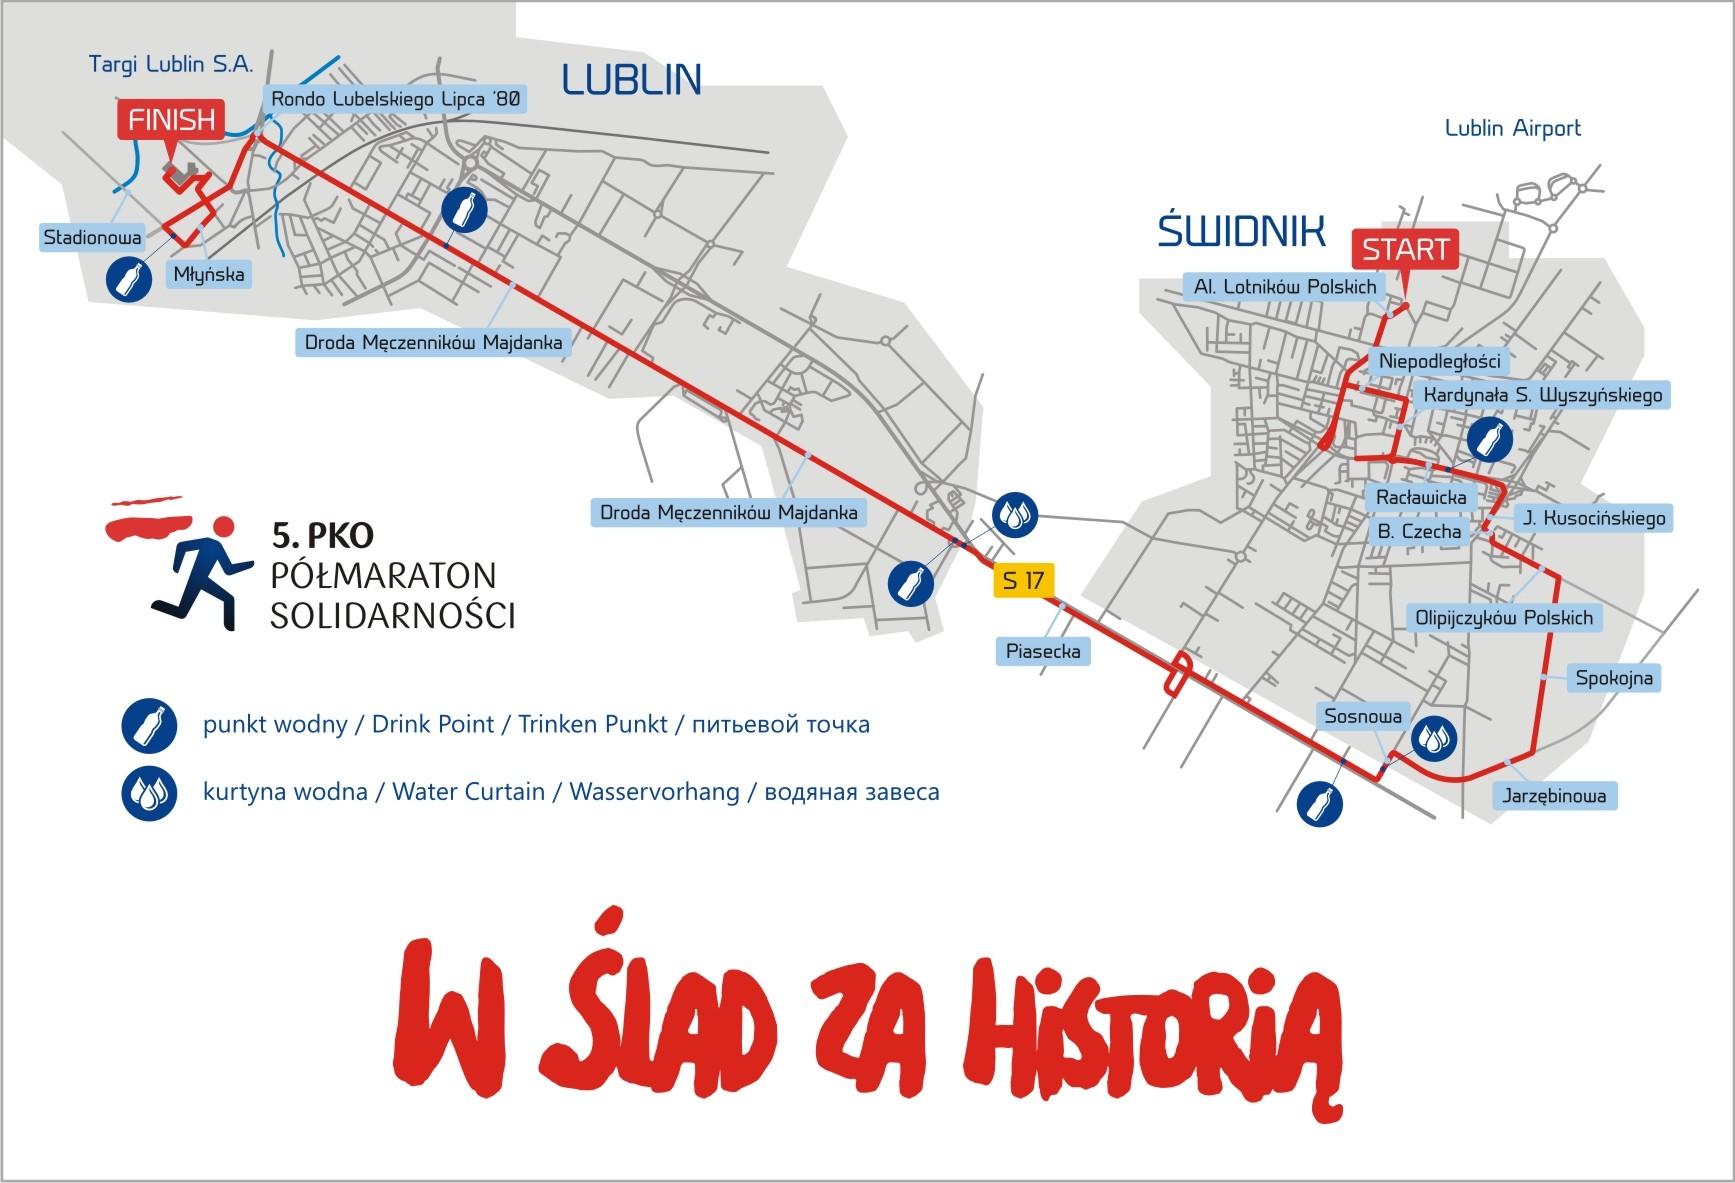 pko półmaraton lublin s-car skup aut Lublin